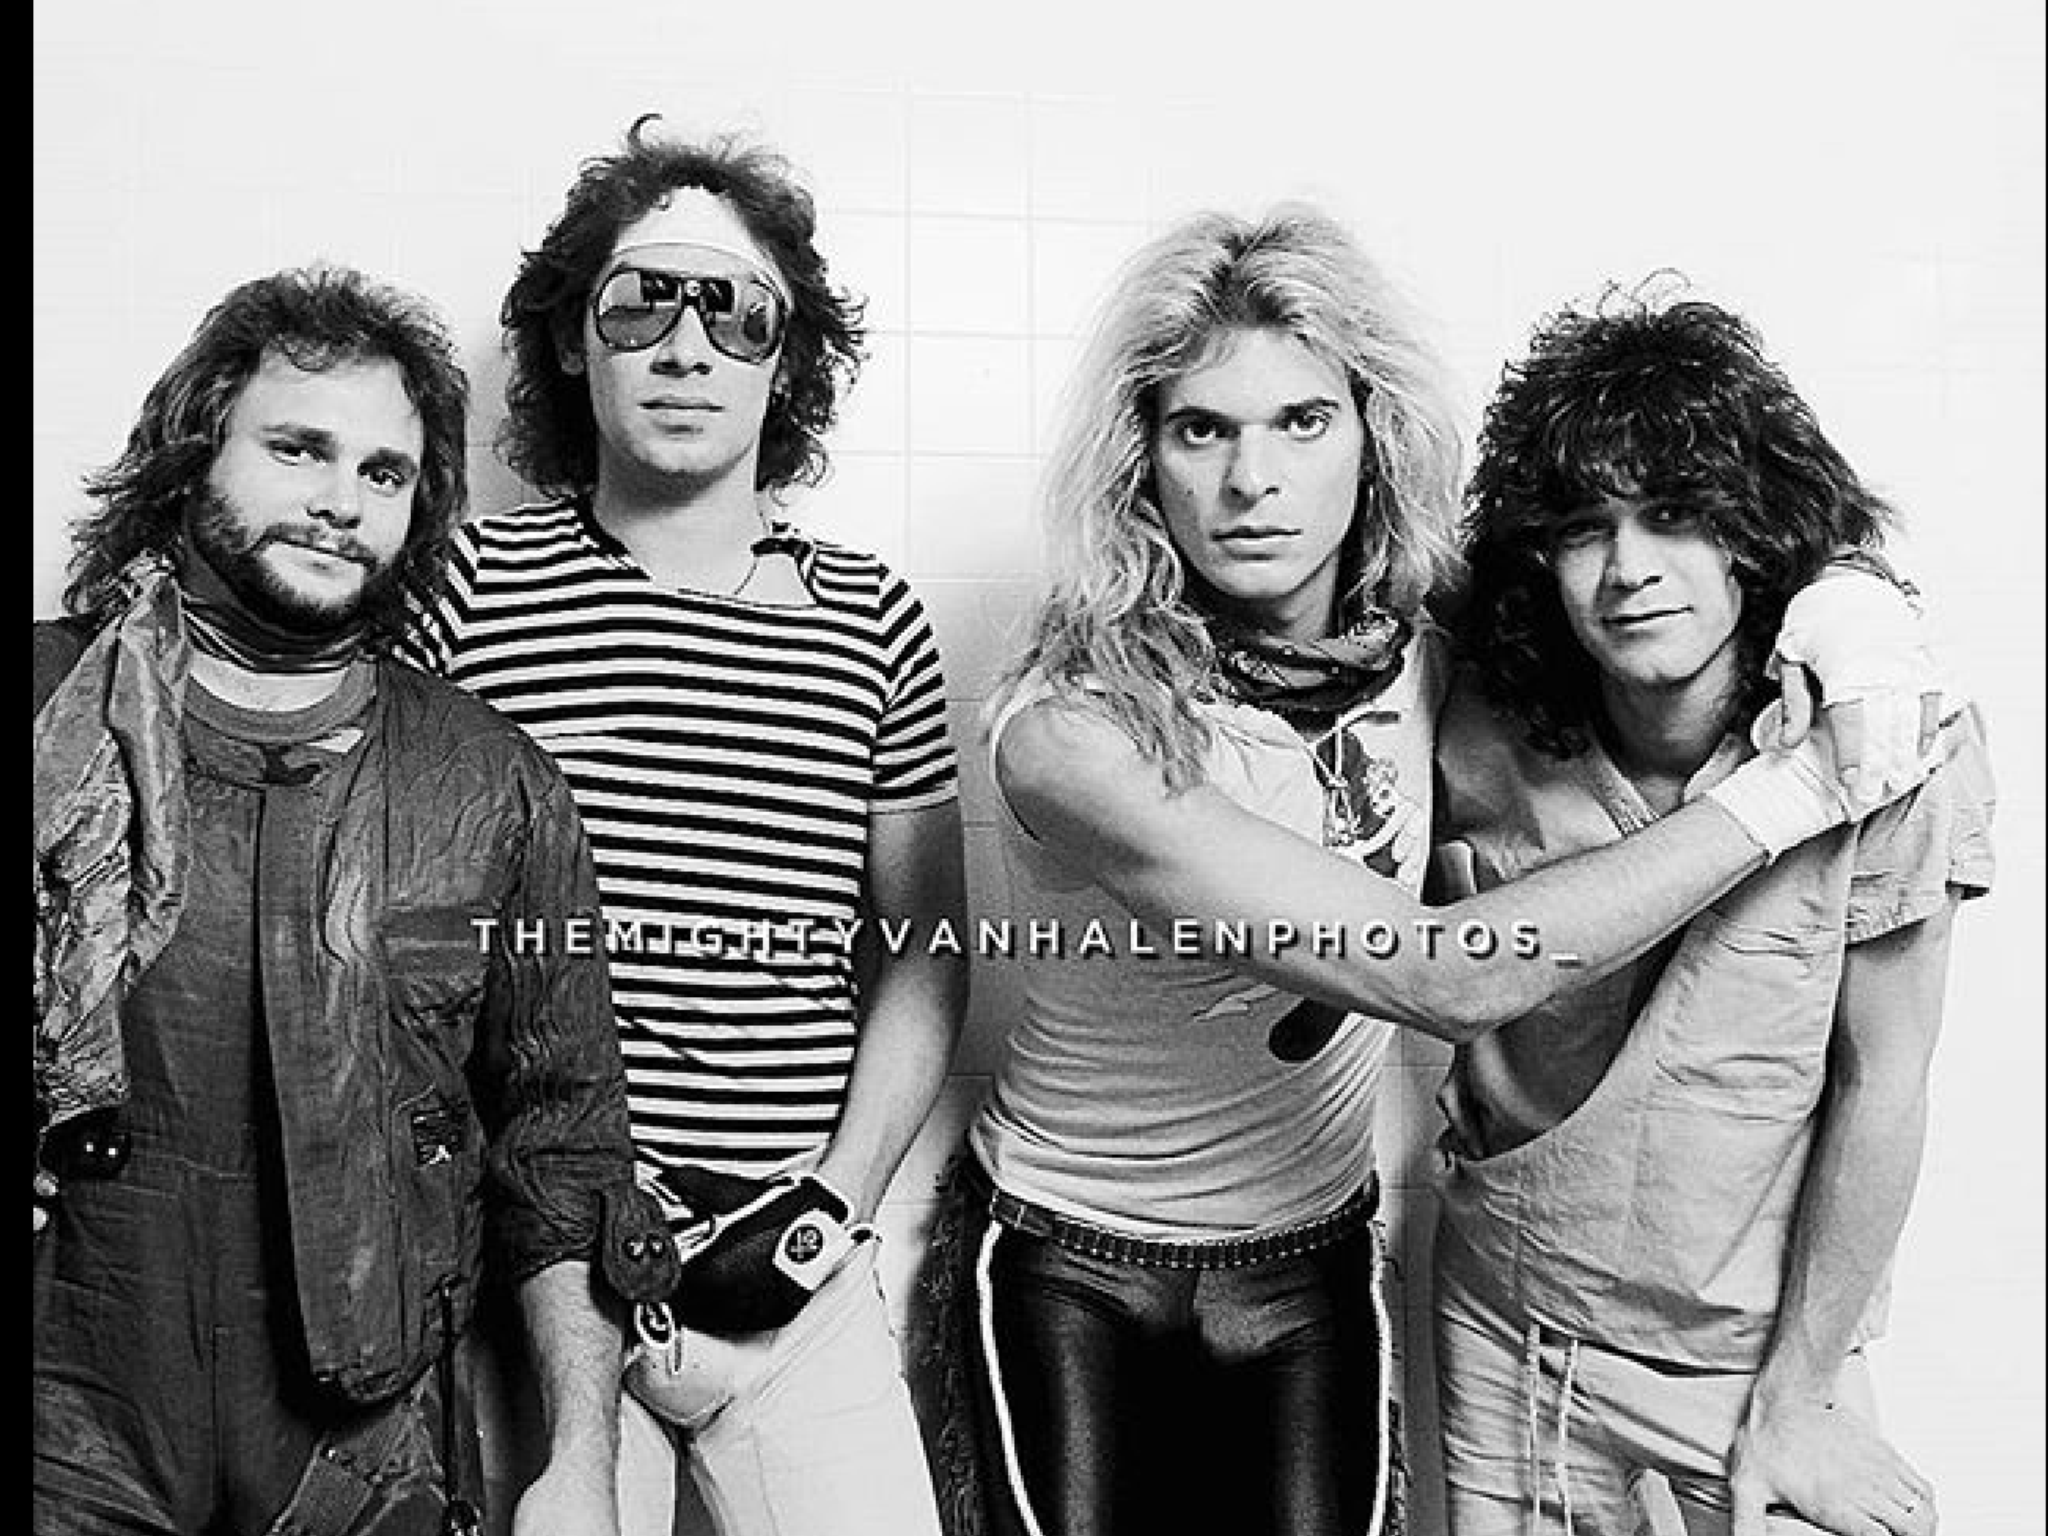 Michael Anthony Alex Van Halen David Lee Roth Eddie Van Halen Eddie Van Halen Van Halen Alex Van Halen